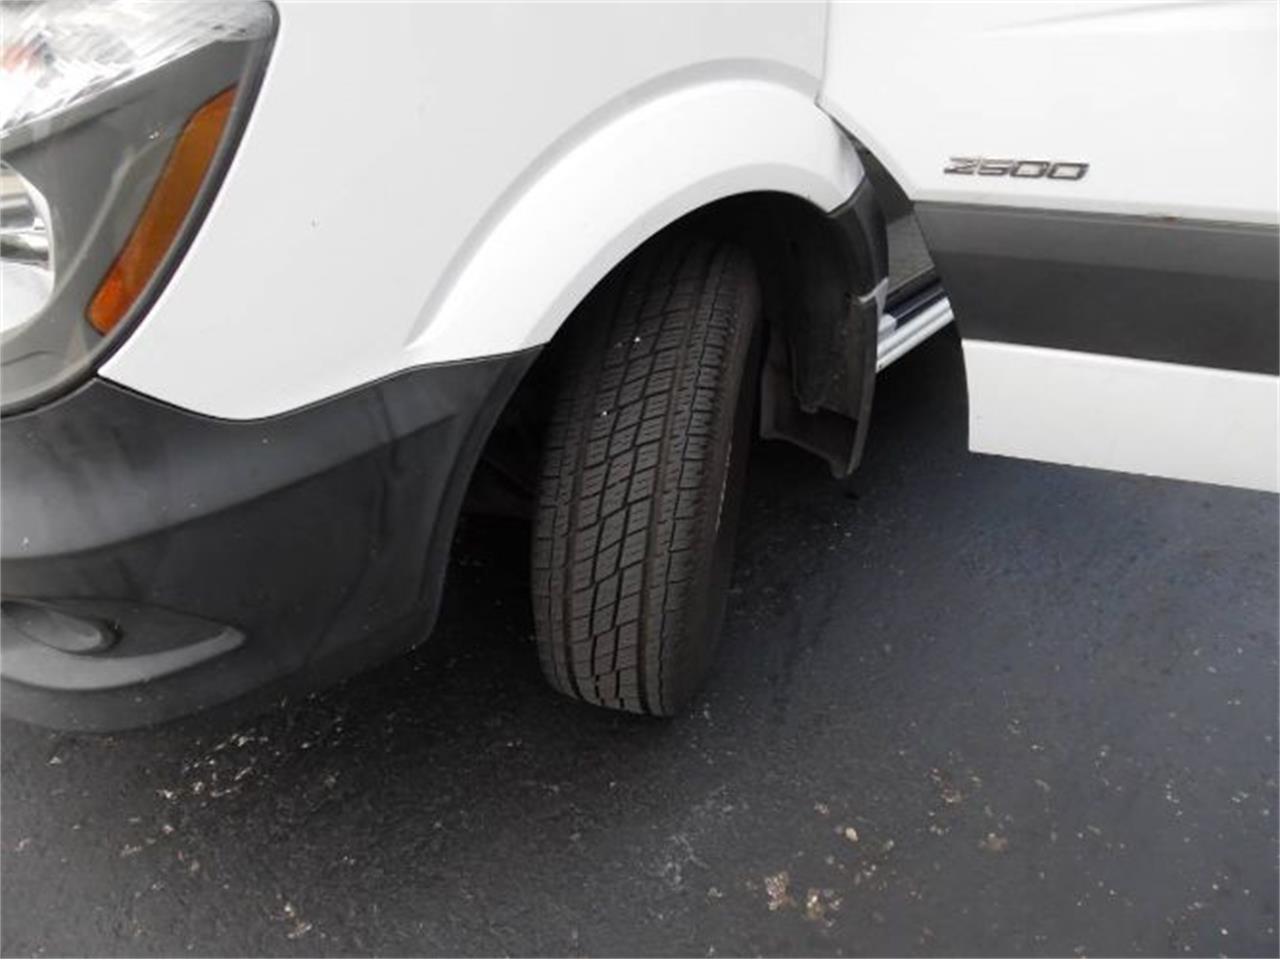 2014 Mercedes-Benz Sprinter (CC-1260929) for sale in Cadillac, Michigan